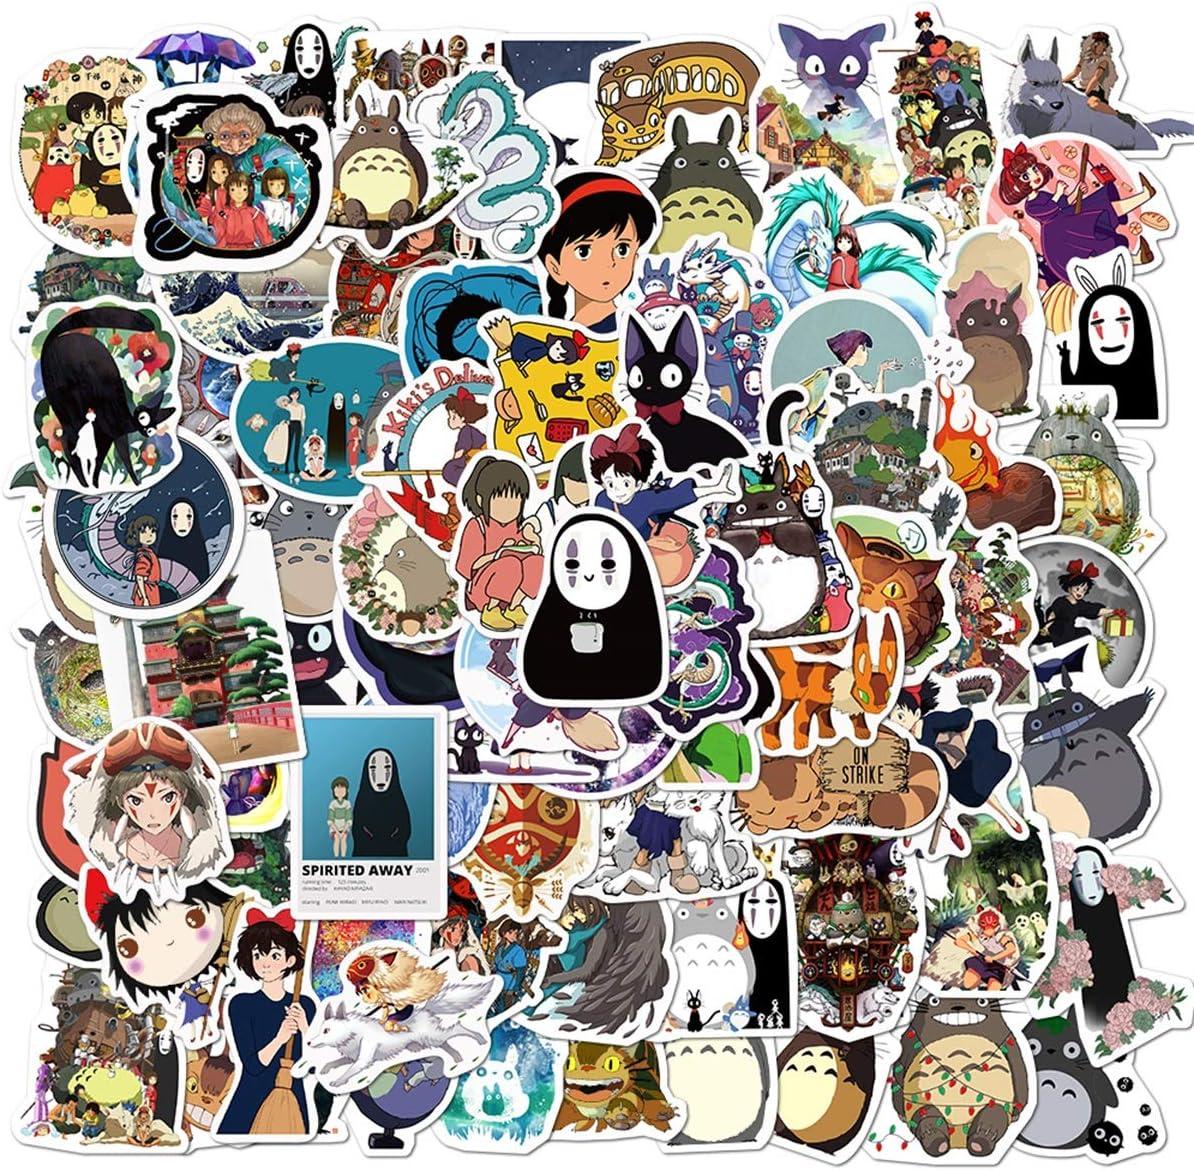 Miyazaki Hayao Stickers 100PCS My Neighbor Totoro Spirited Away Studio Ghibli Stickers Japanese Animation Anime Stickers Waterproof Vinyl Decals for Laptop, Water Bottles, Skateboard, Luggage, Phone